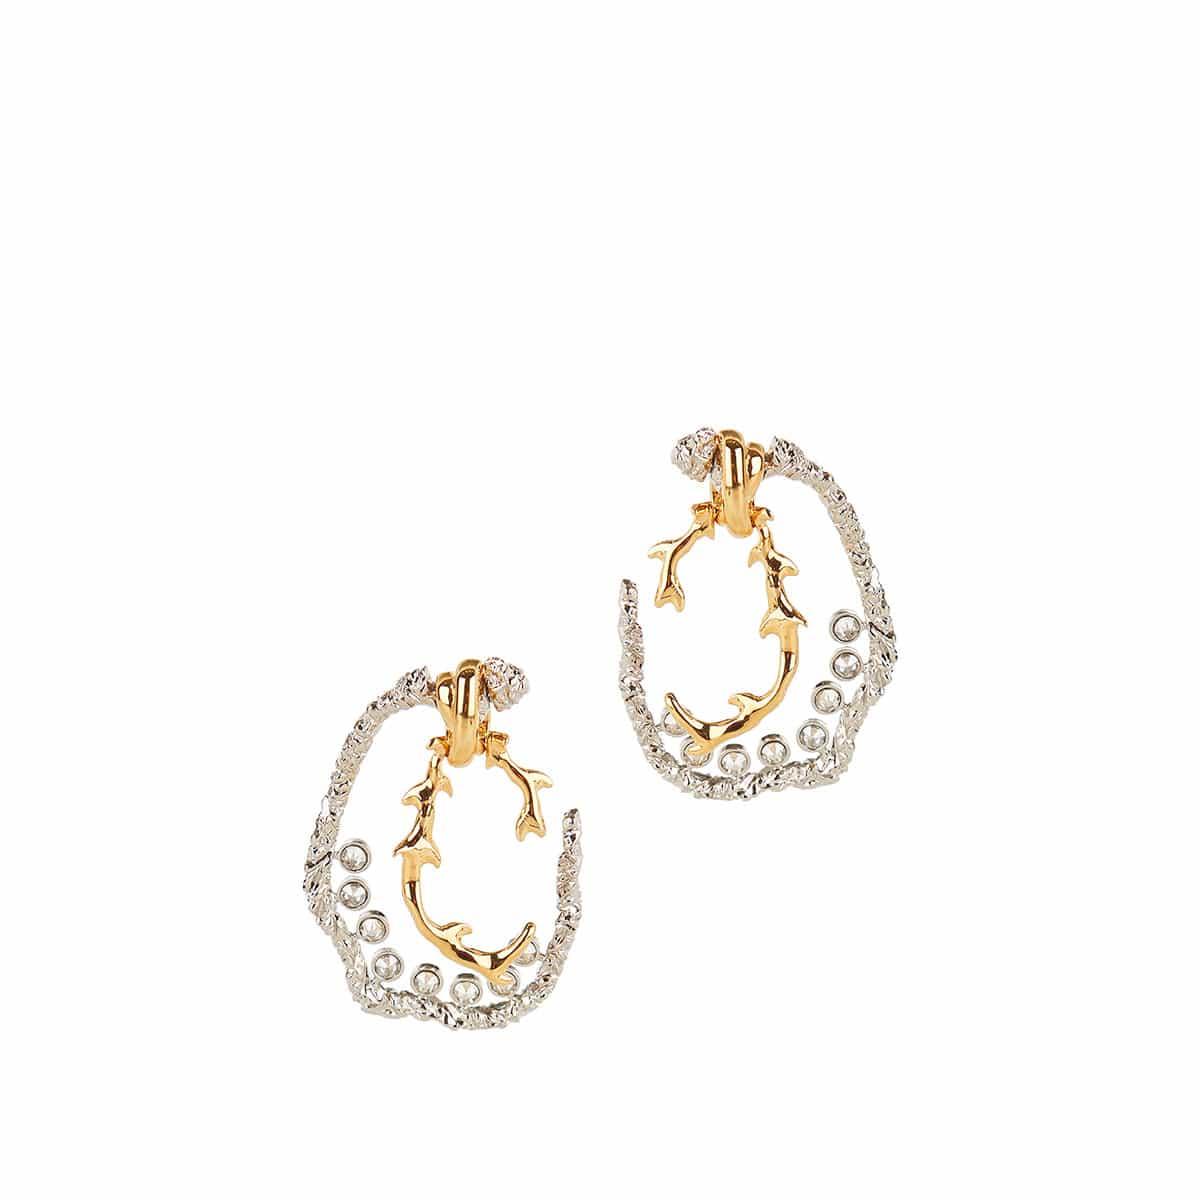 Two-tone crystal-embellished brass earrings